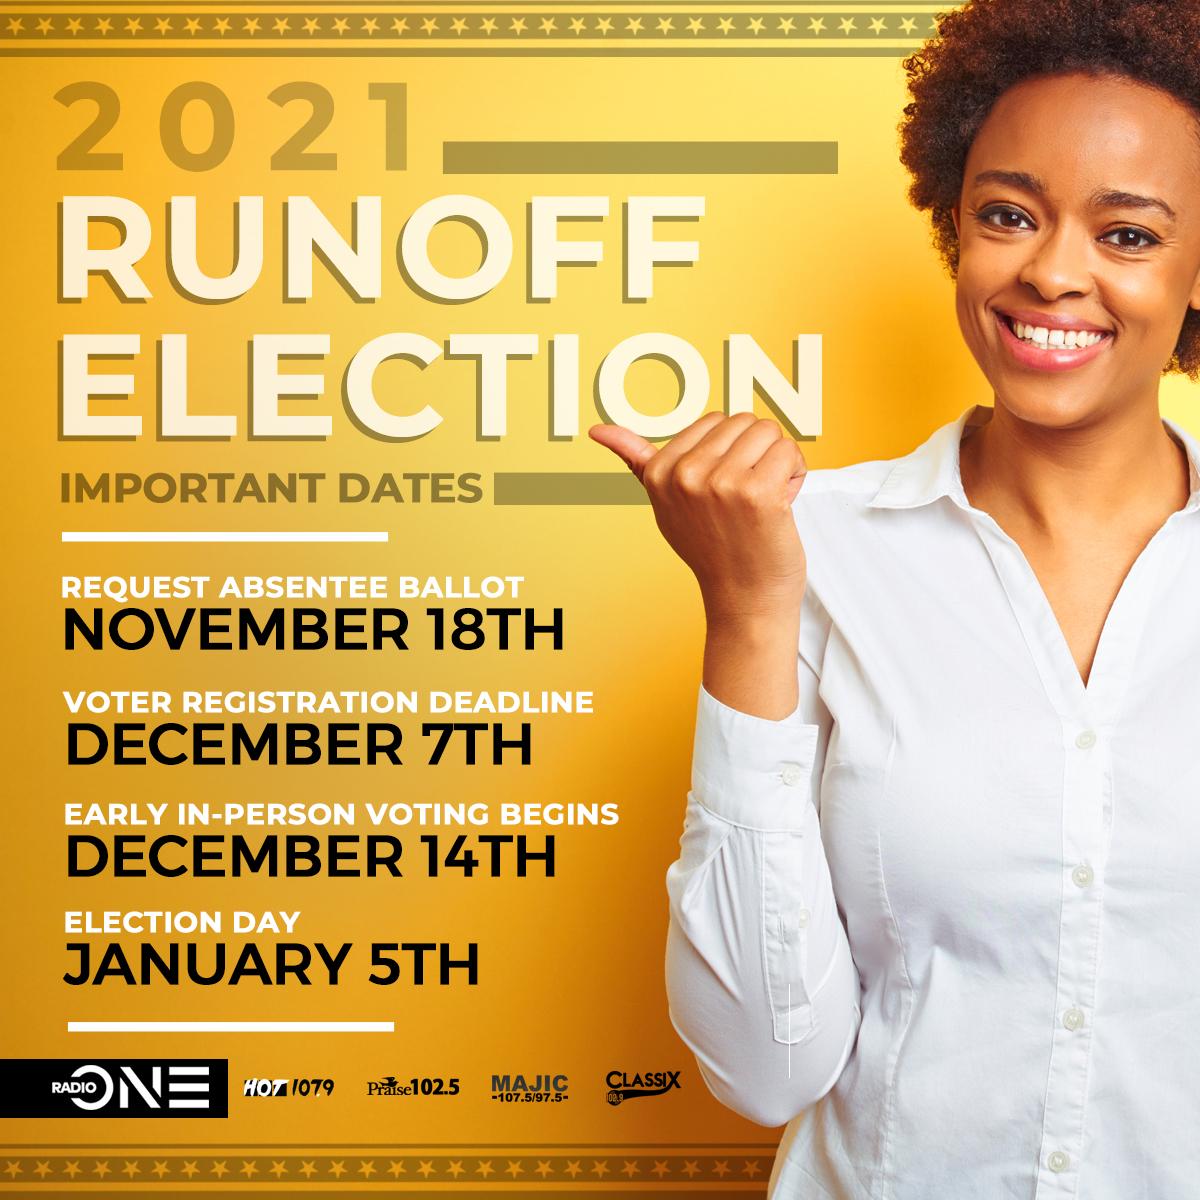 Georgia Runoff election dates 2020